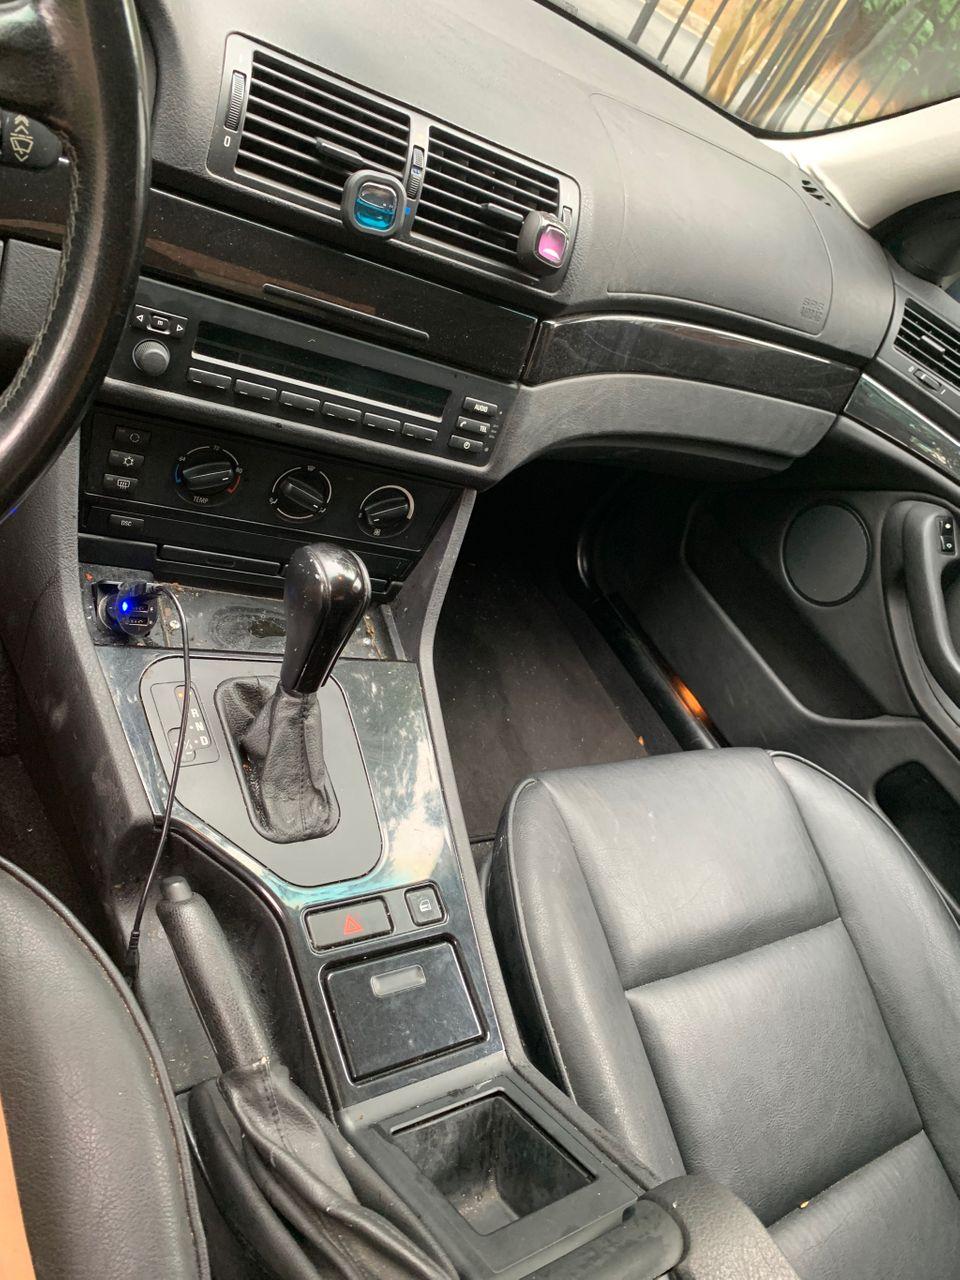 2001 BMW 5 Series 525i | Smyrna, GA, Steel Blue Metallic (Blue), Rear Wheel